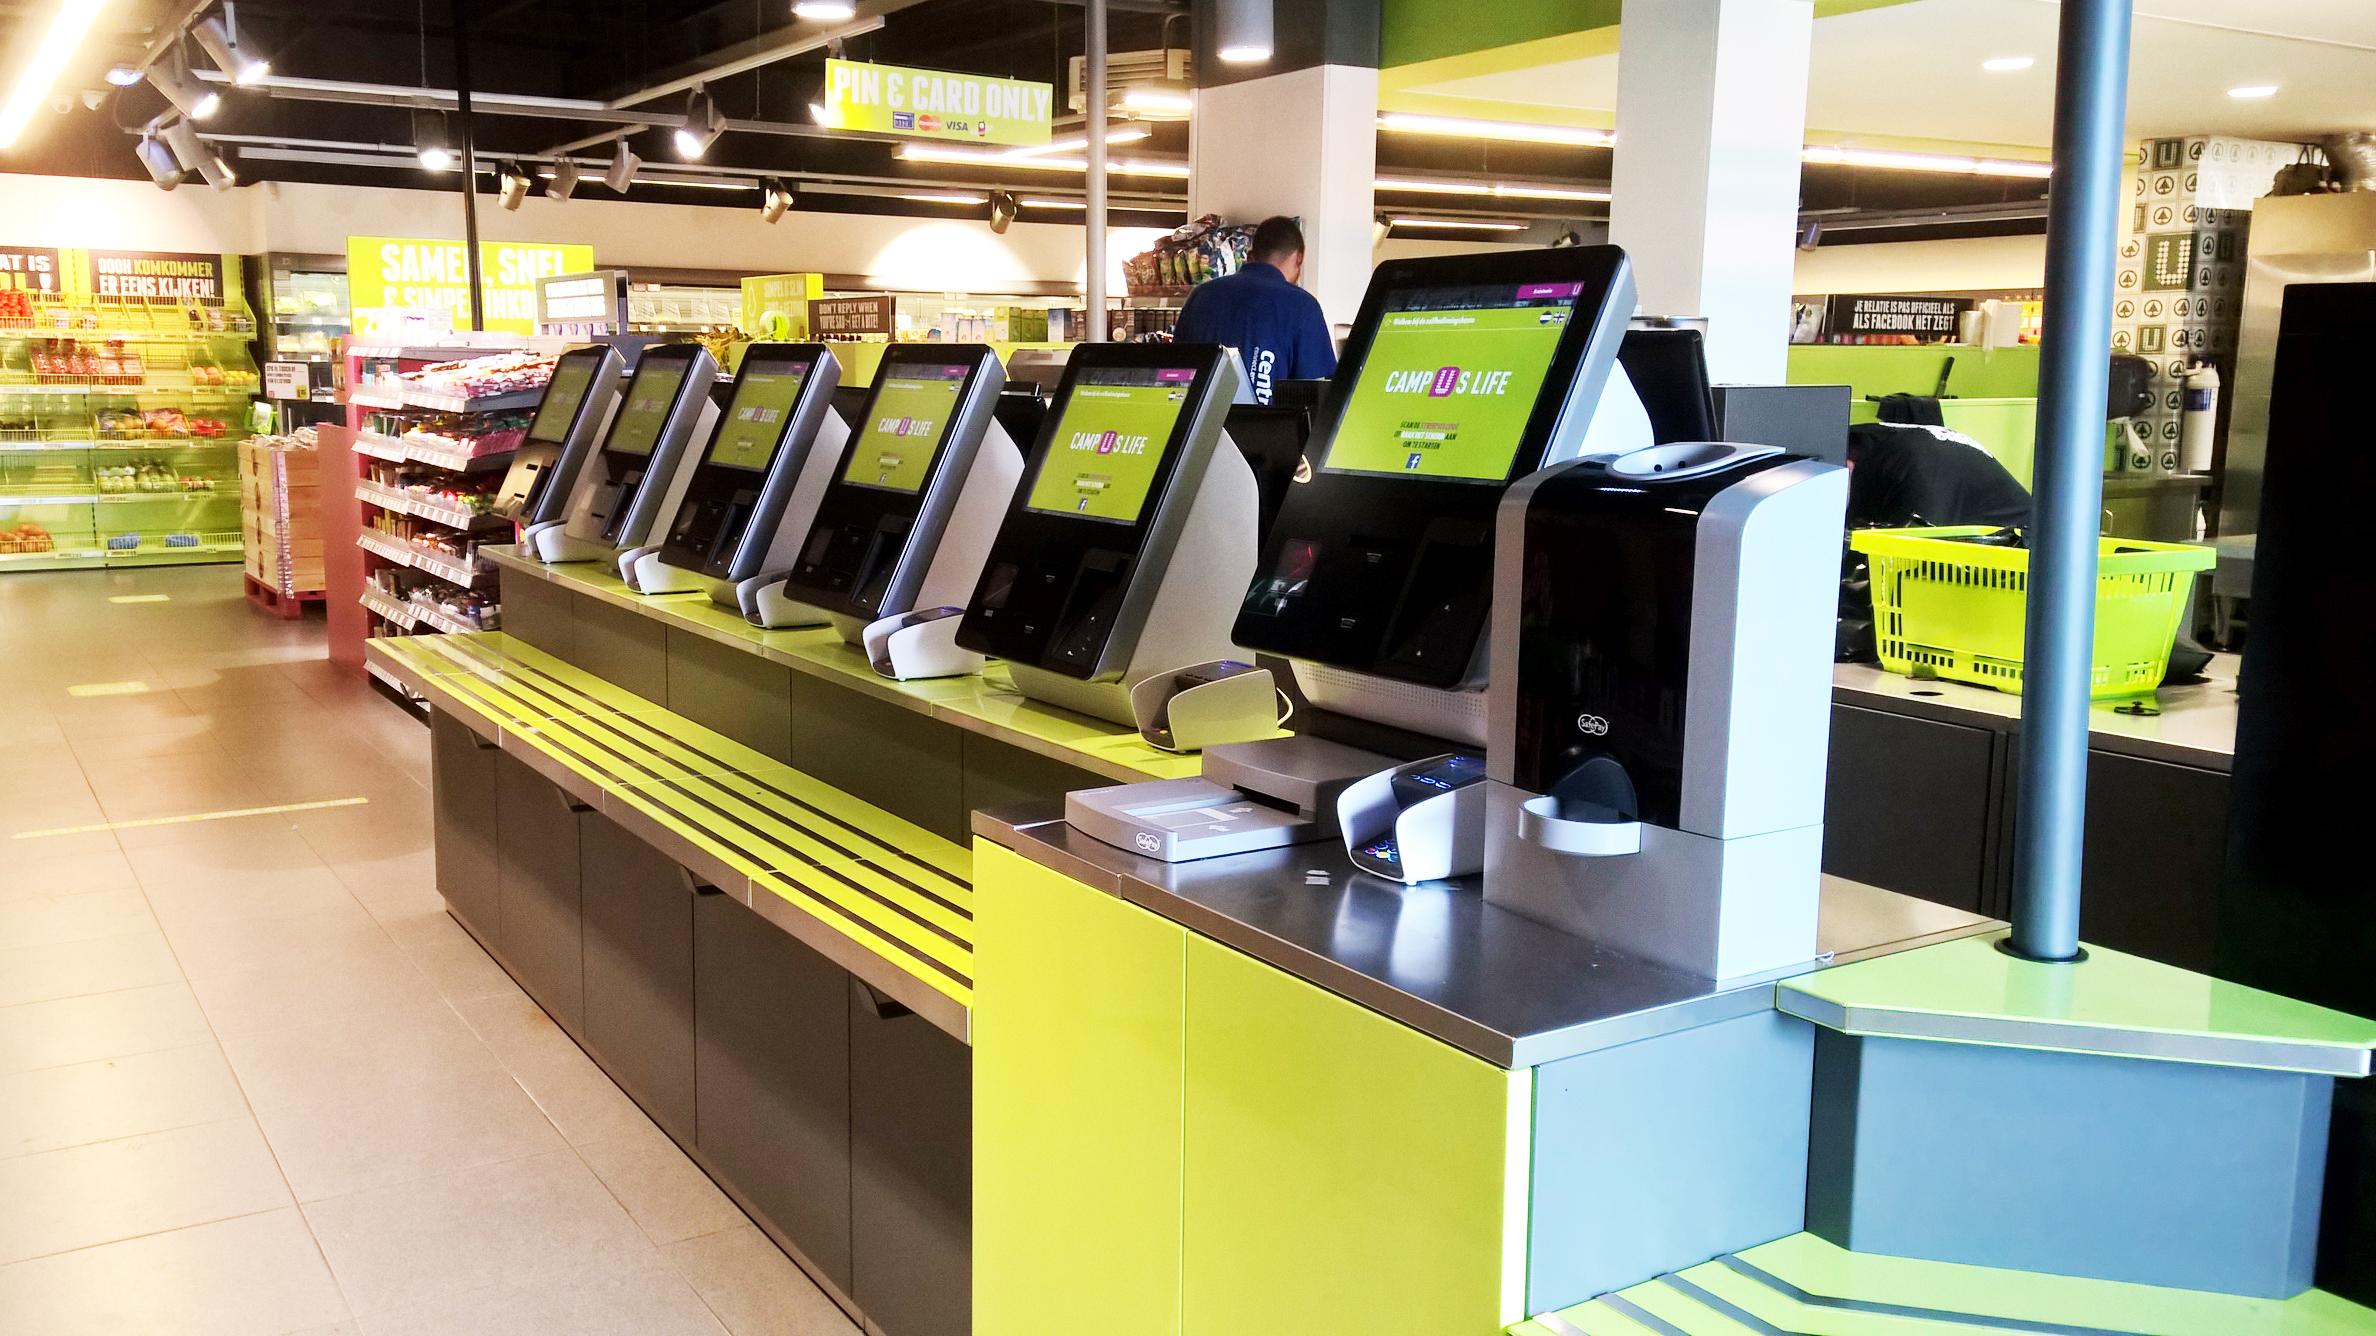 SafePay Casse di self checkout